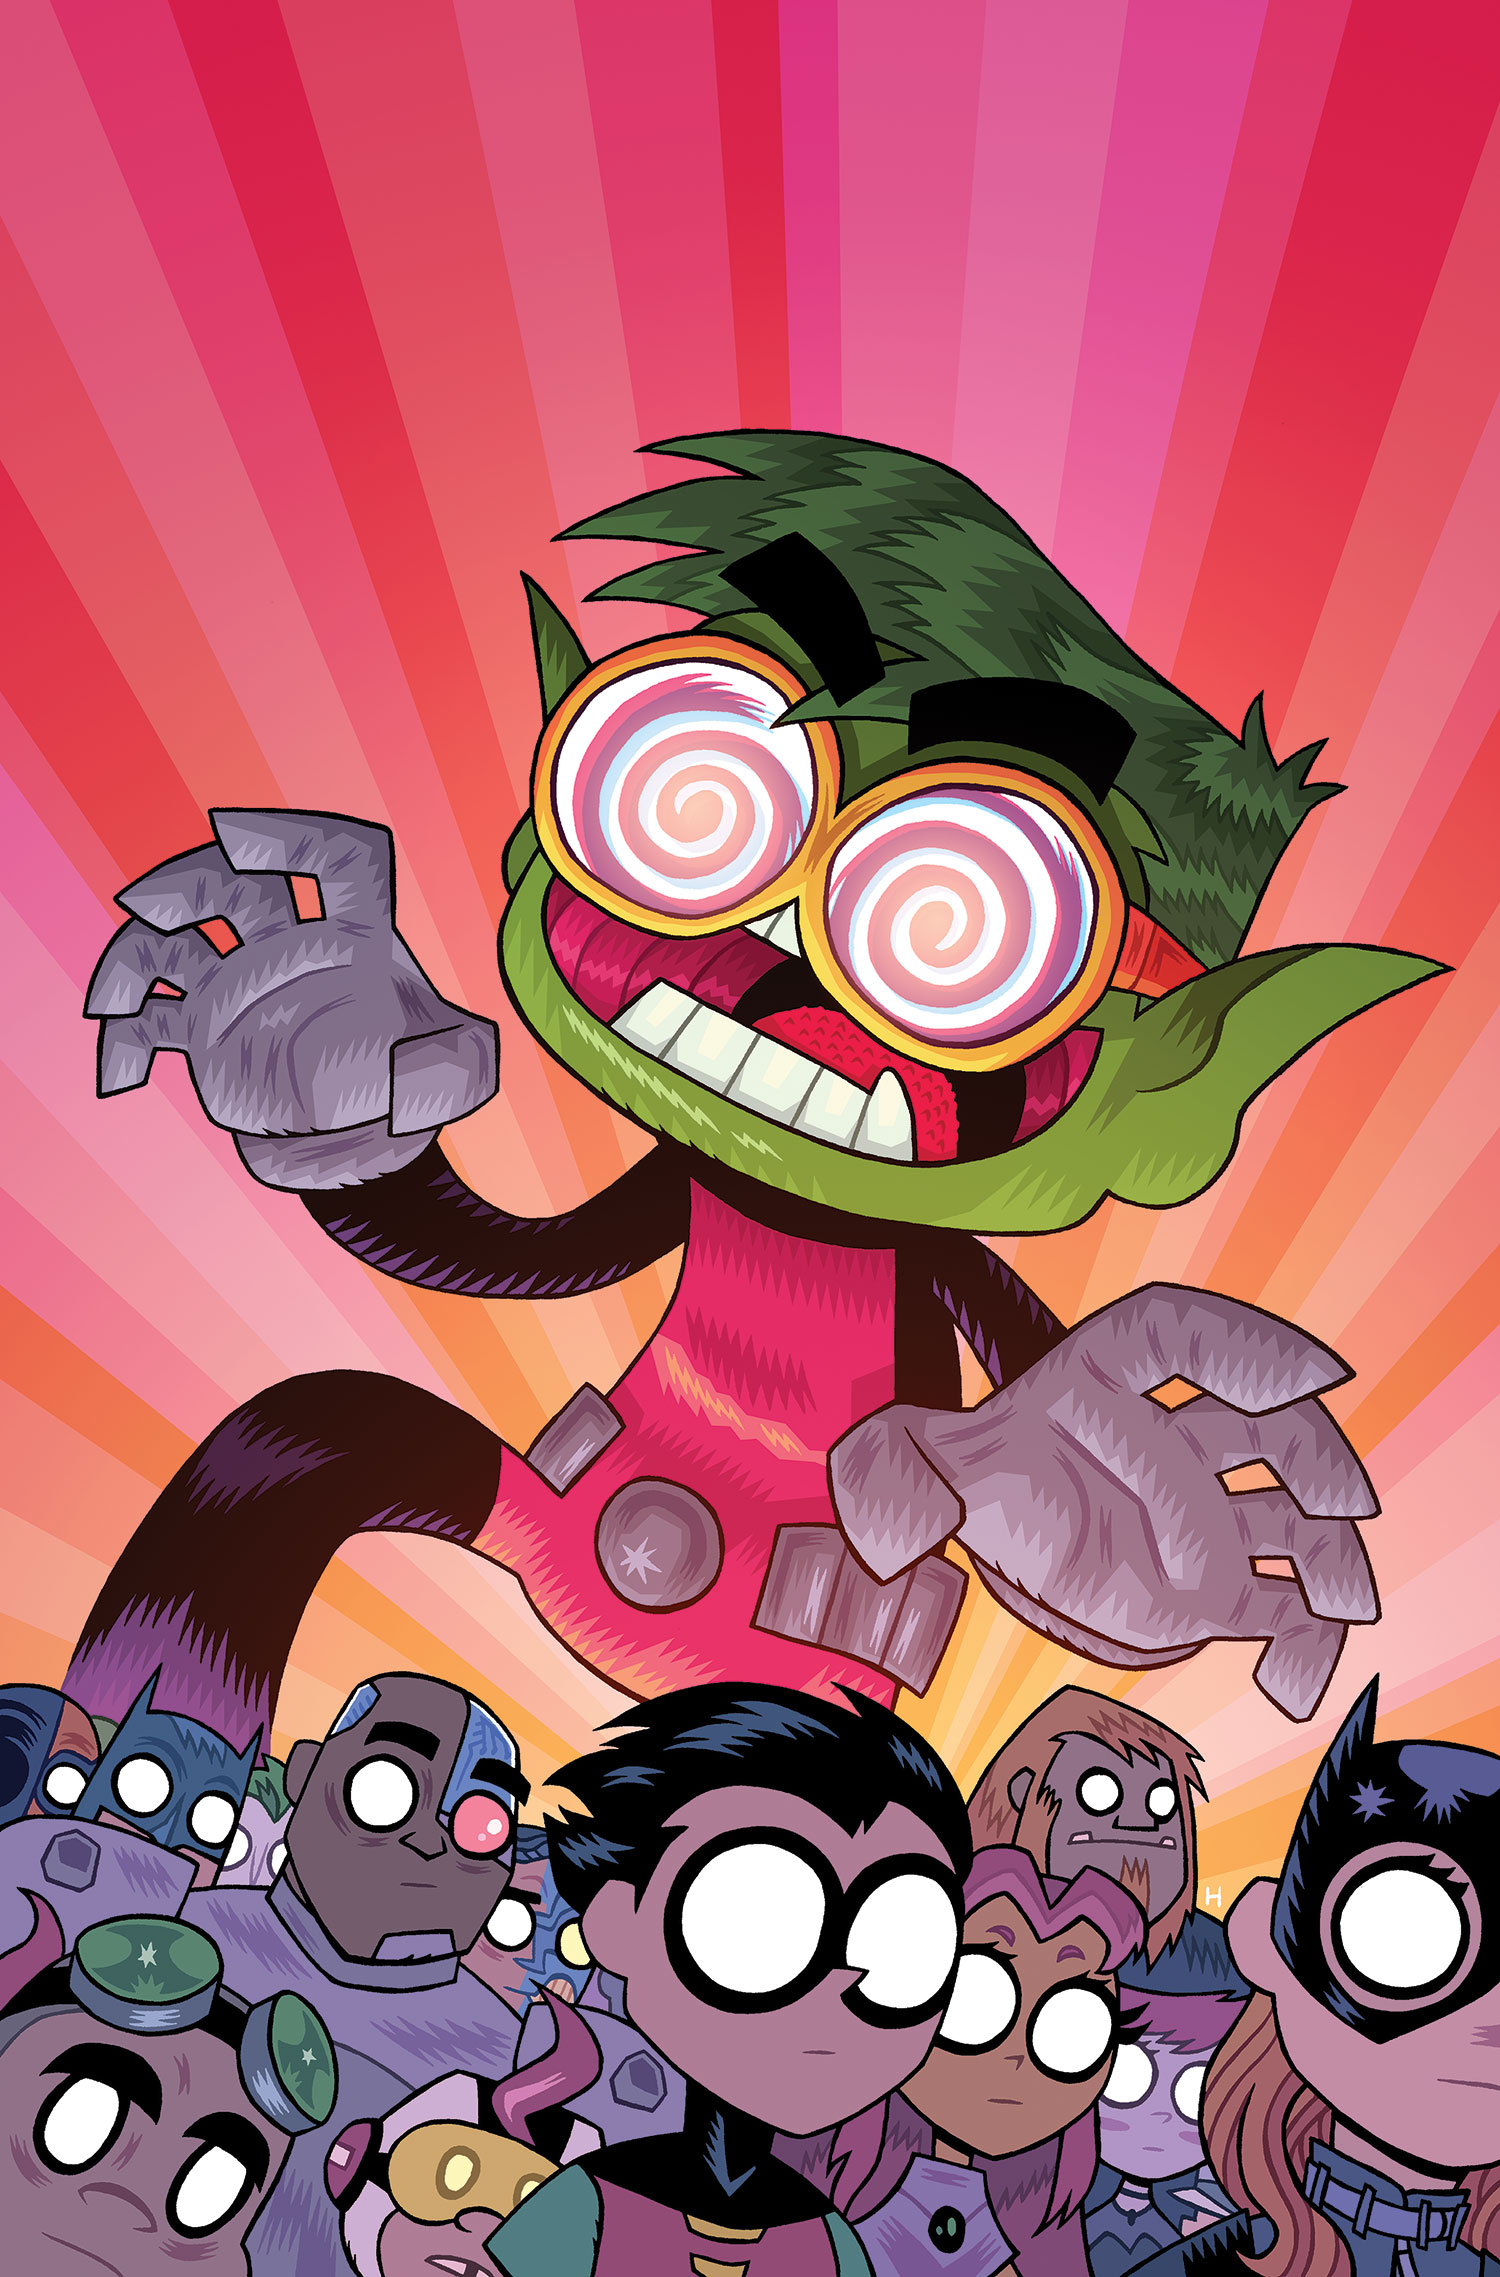 Teen Titans Go! Vol 2 10 Textless.jpg